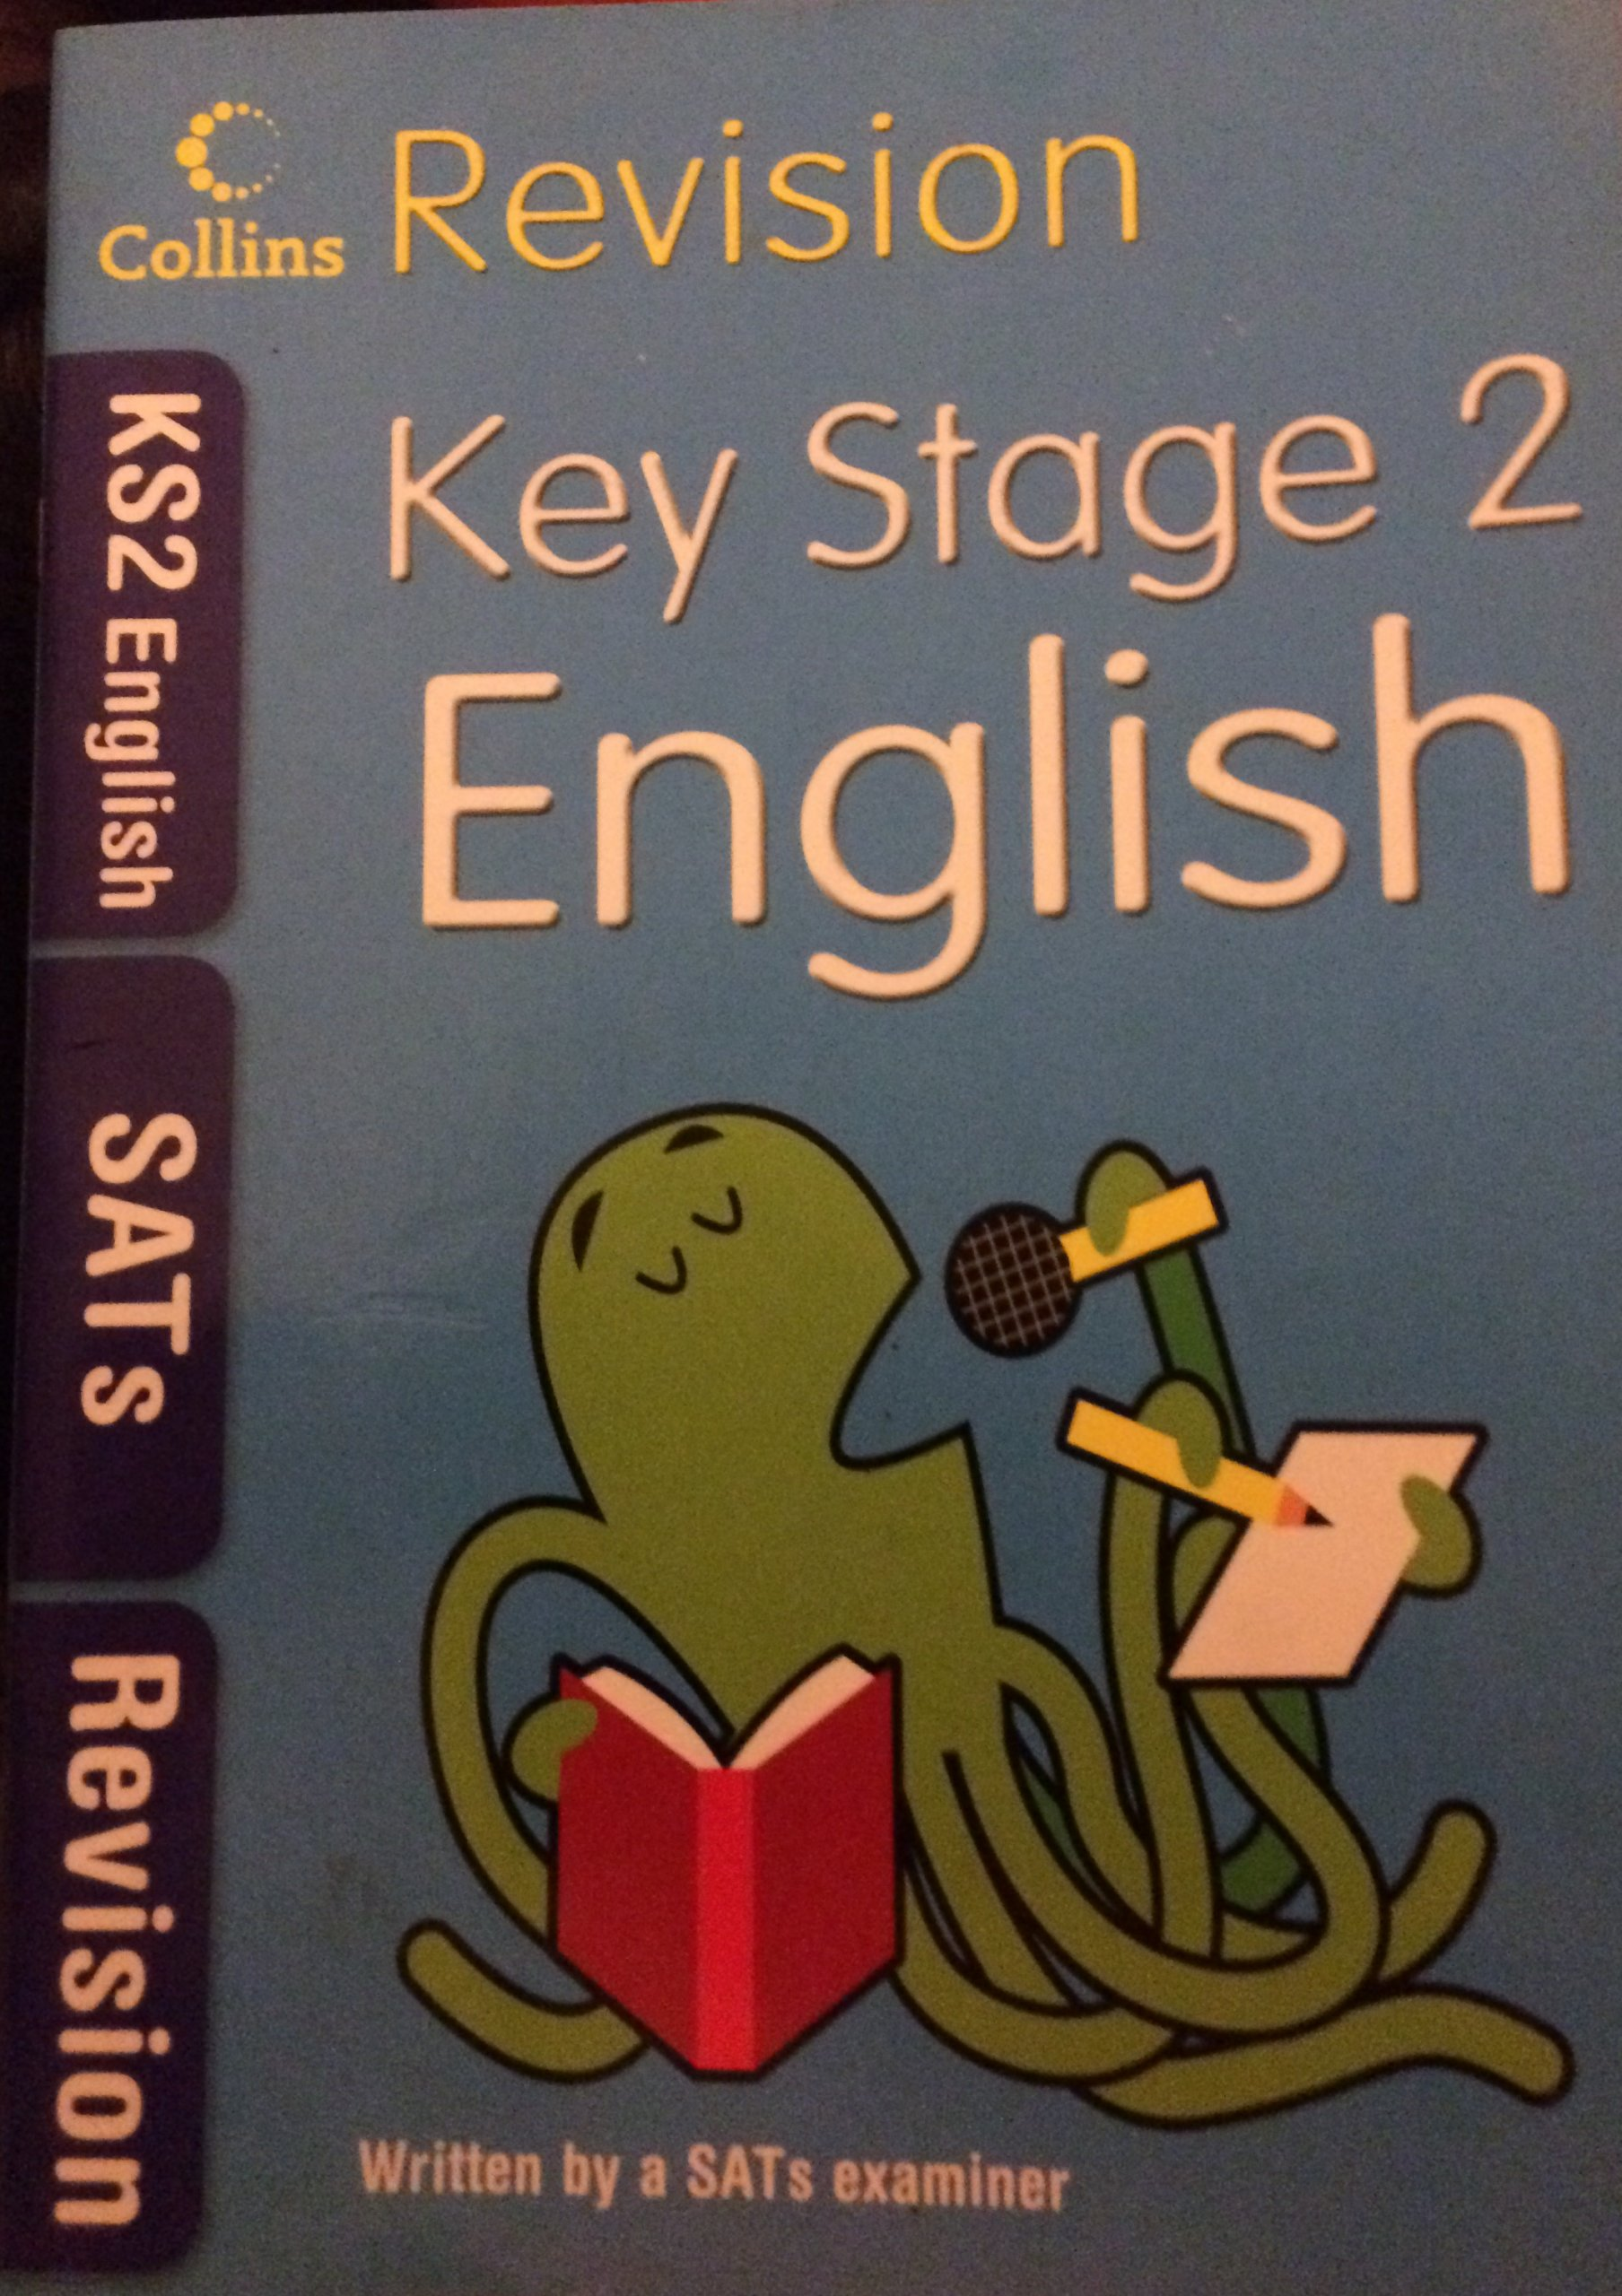 Collins Revision Books